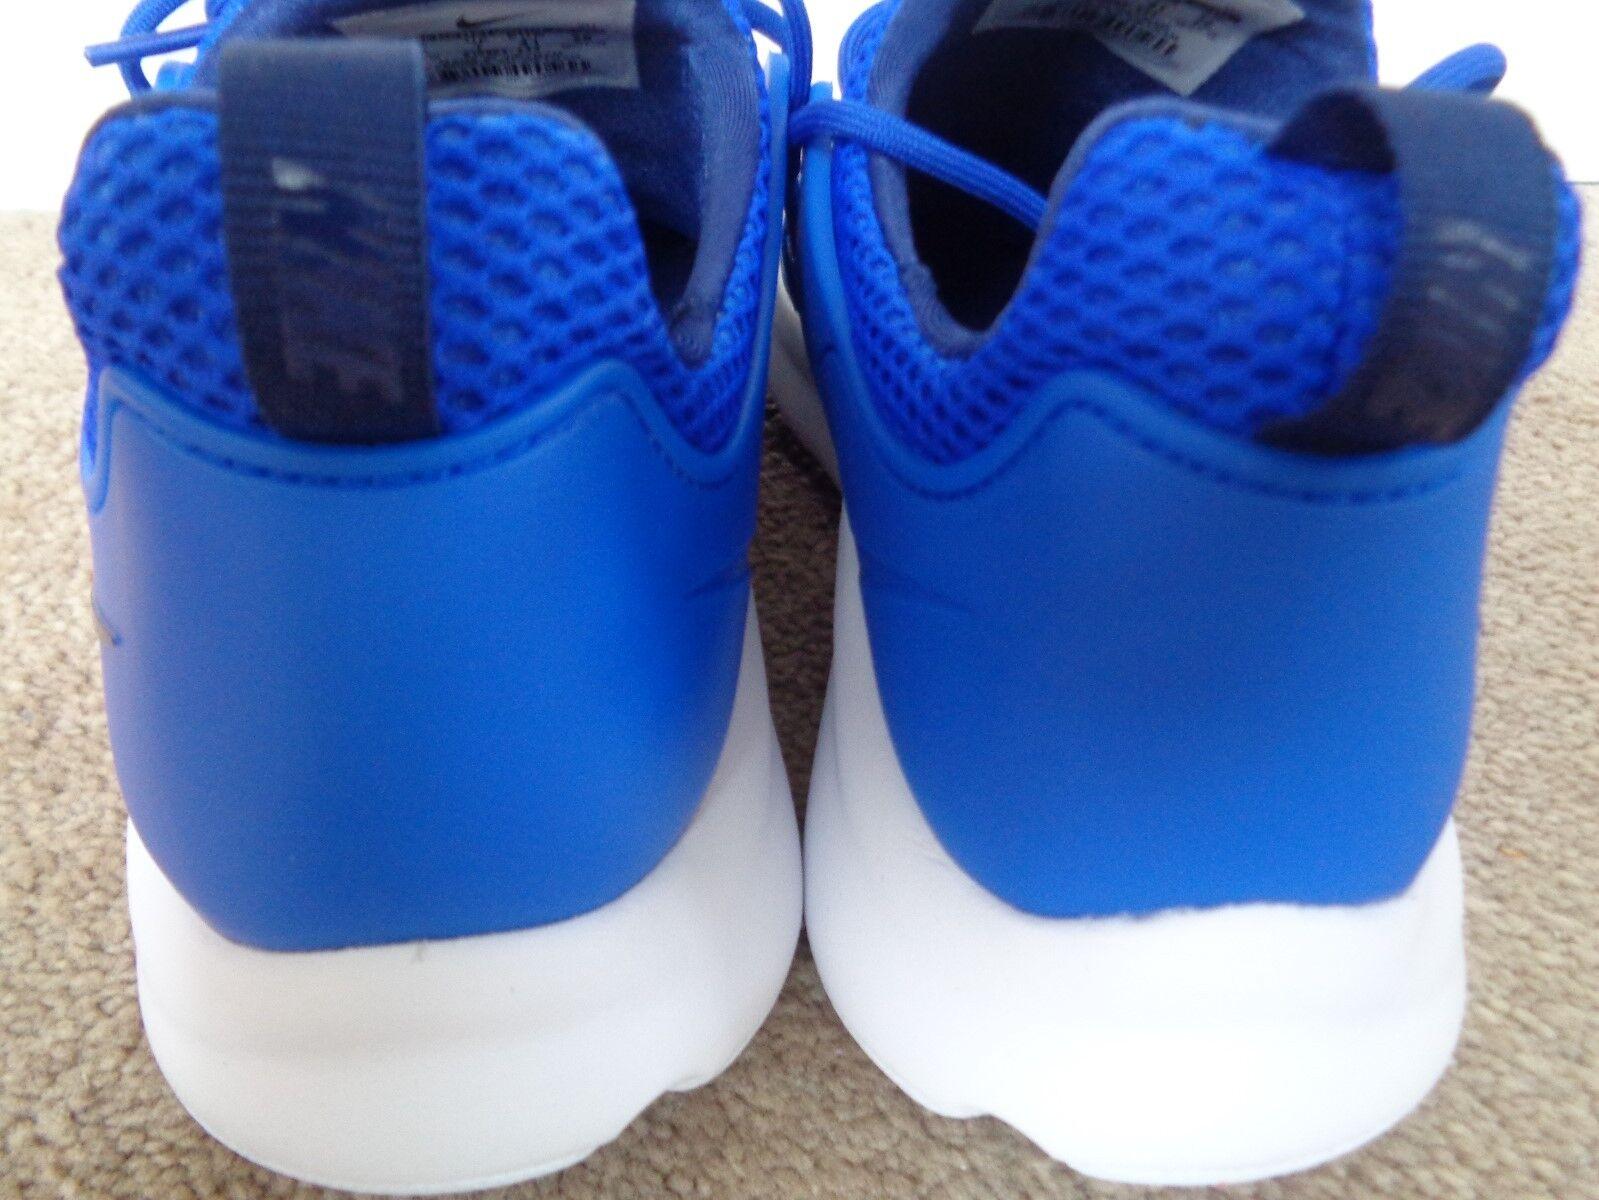 Nike Darwin Linea Uomo Scarpe Ginnastica 819803 819803 Ginnastica 444 EU 41 US 8 Nuovo + Scatola e791dd